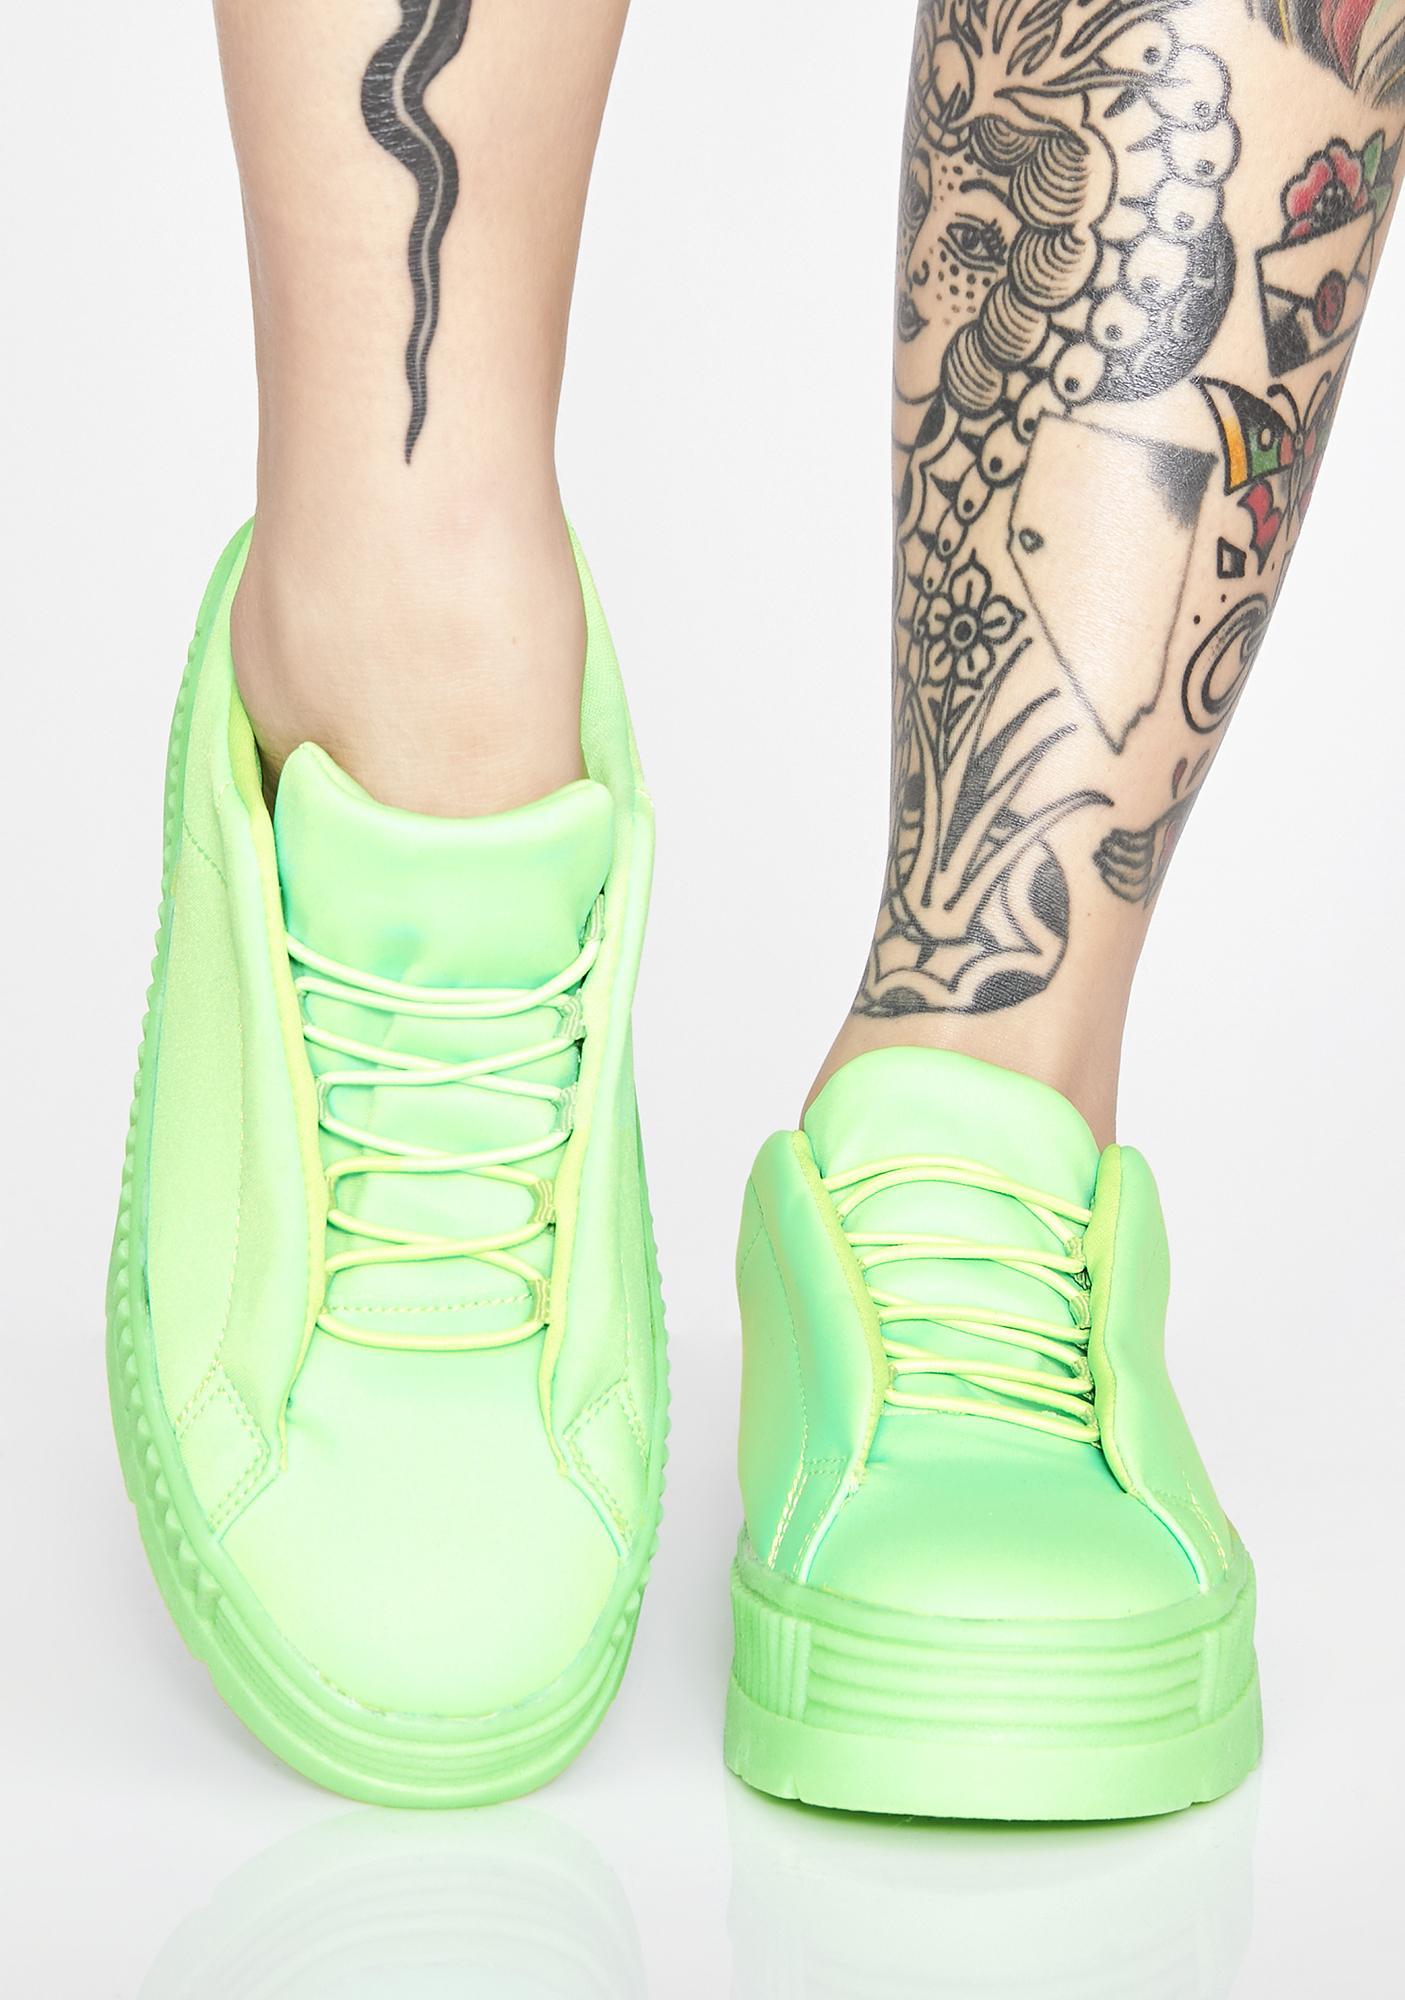 8b75d29be50 Slime Anti-Gravity Platform Sneakers